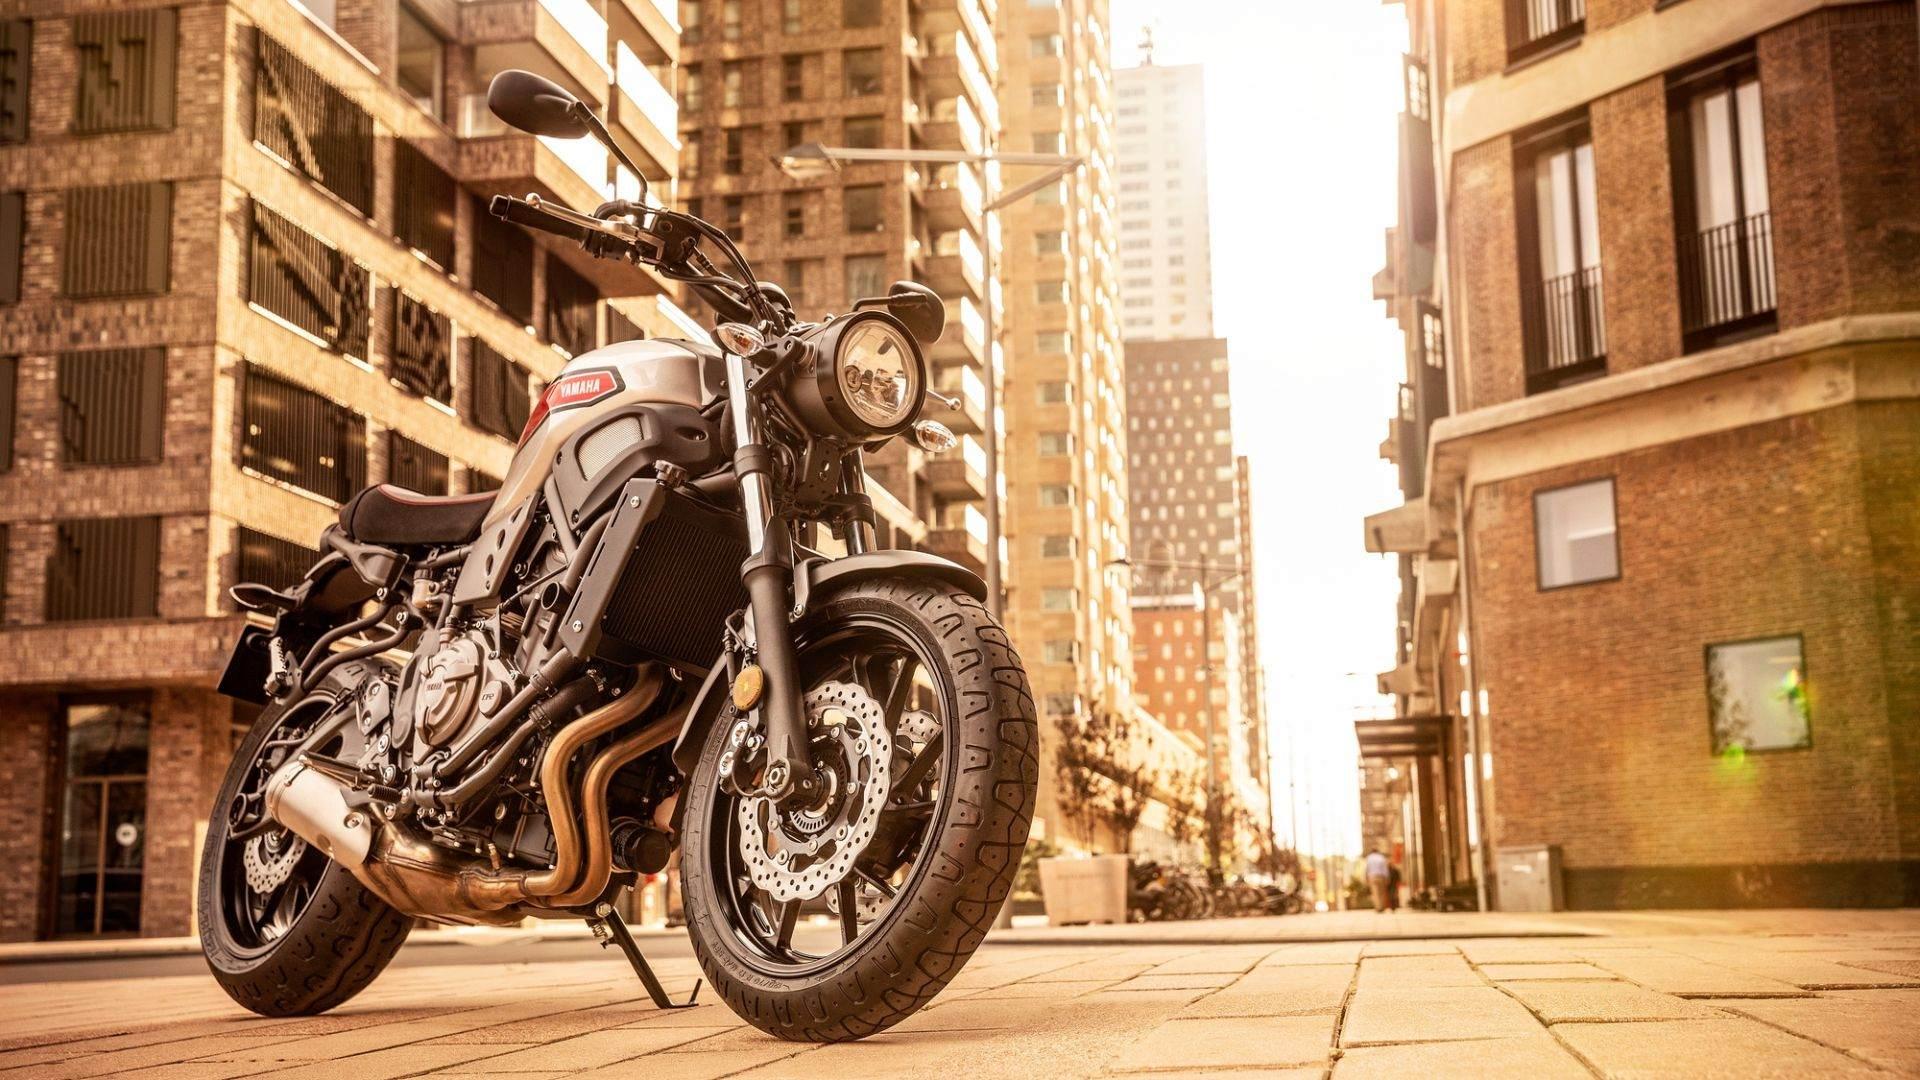 2019 Yamaha XS700 EU Matt Grey Static 005 03